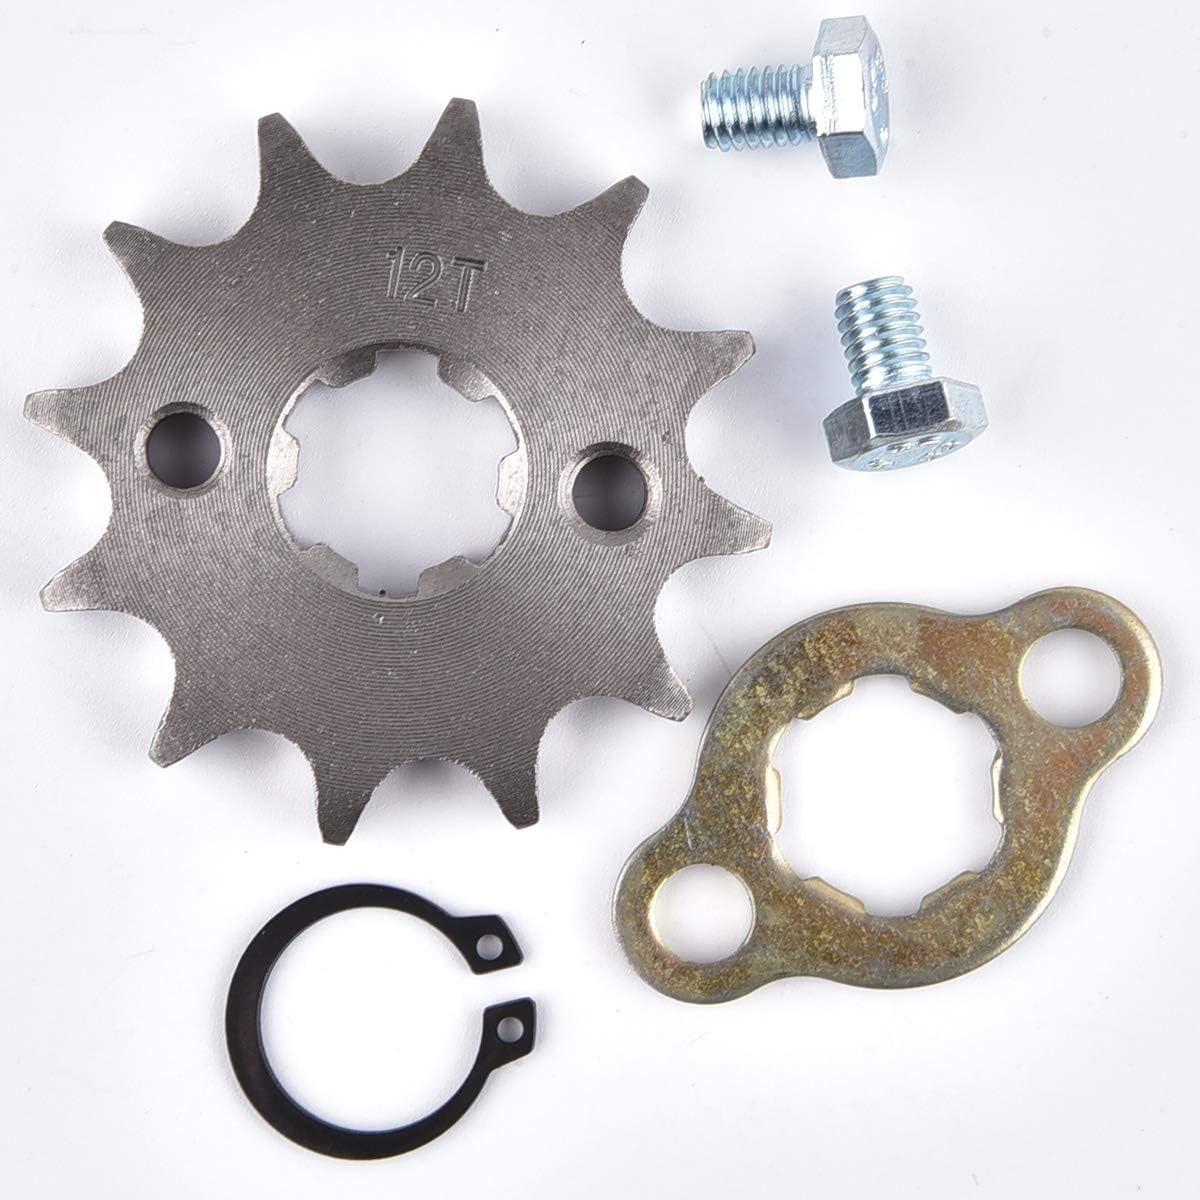 428 12T 17mm Front Engine Sprocket Replacement for 50cc 70cc 110cc 125cc 140cc 160cc ATV Dirt Bike Quad TaoTao Roketa Sunl